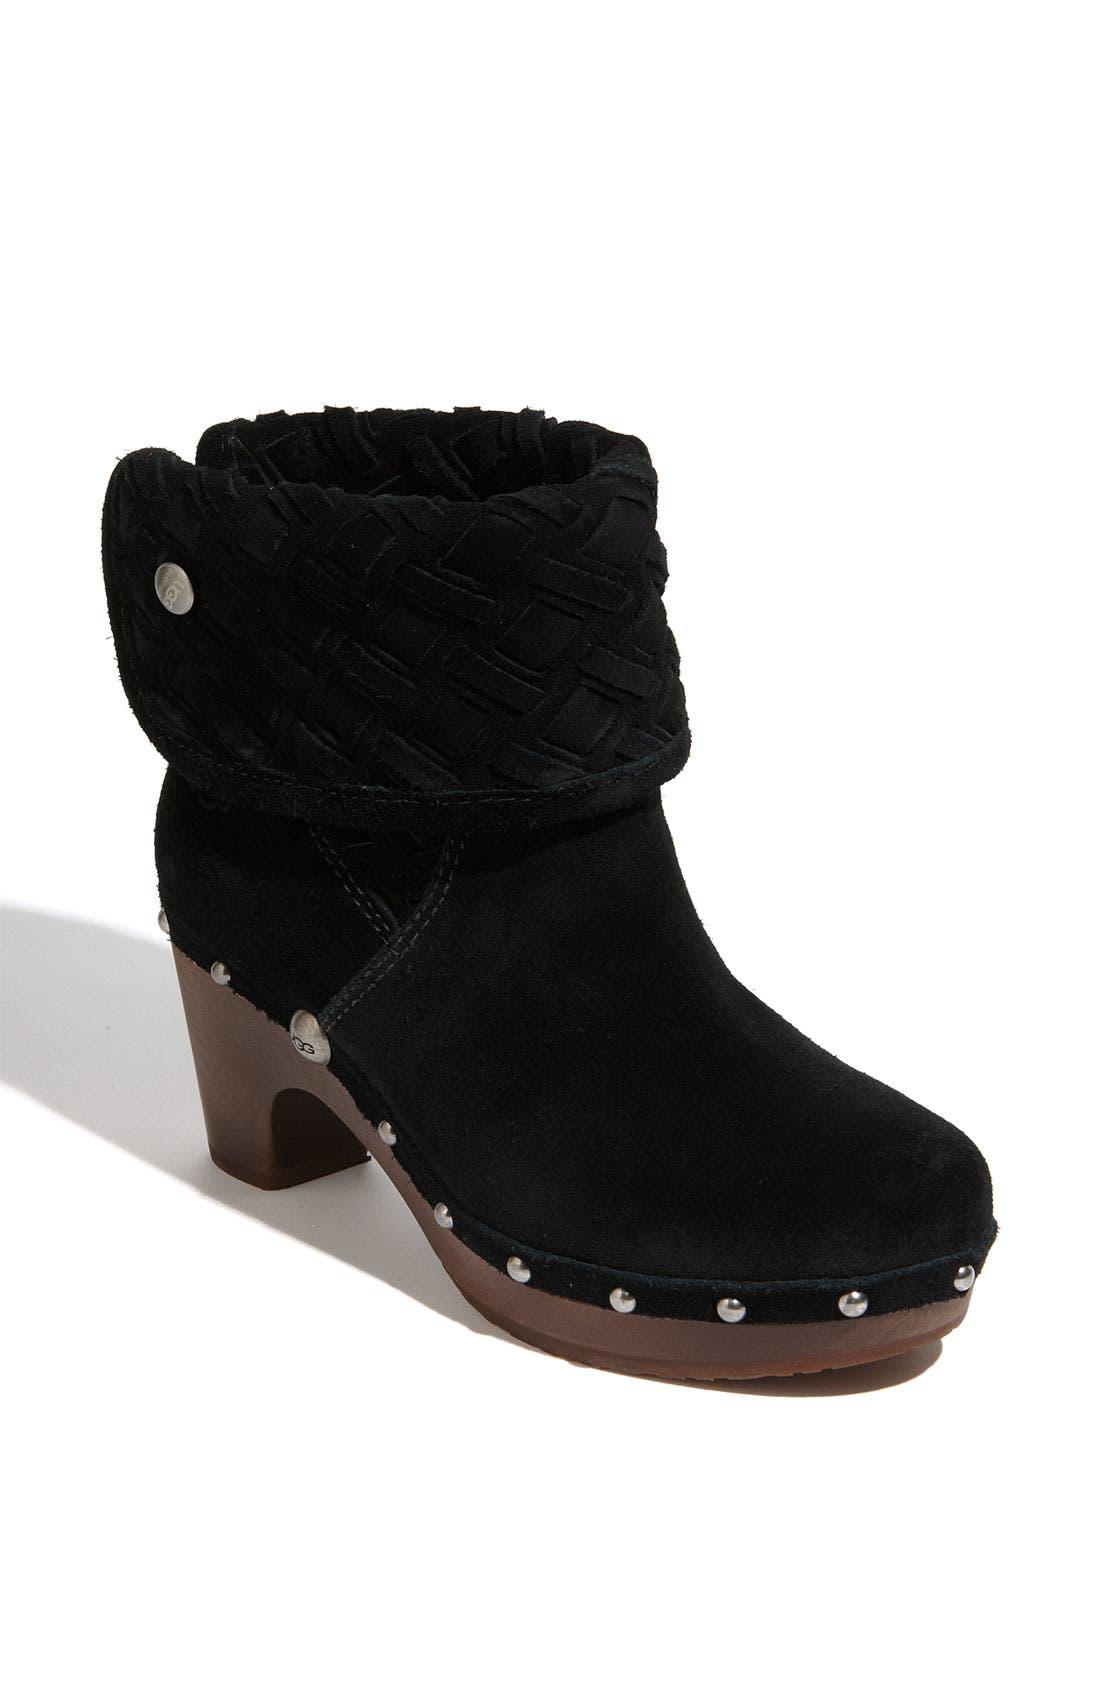 Alternate Image 1 Selected - UGG® Australia 'Lynnea Weave' Boot